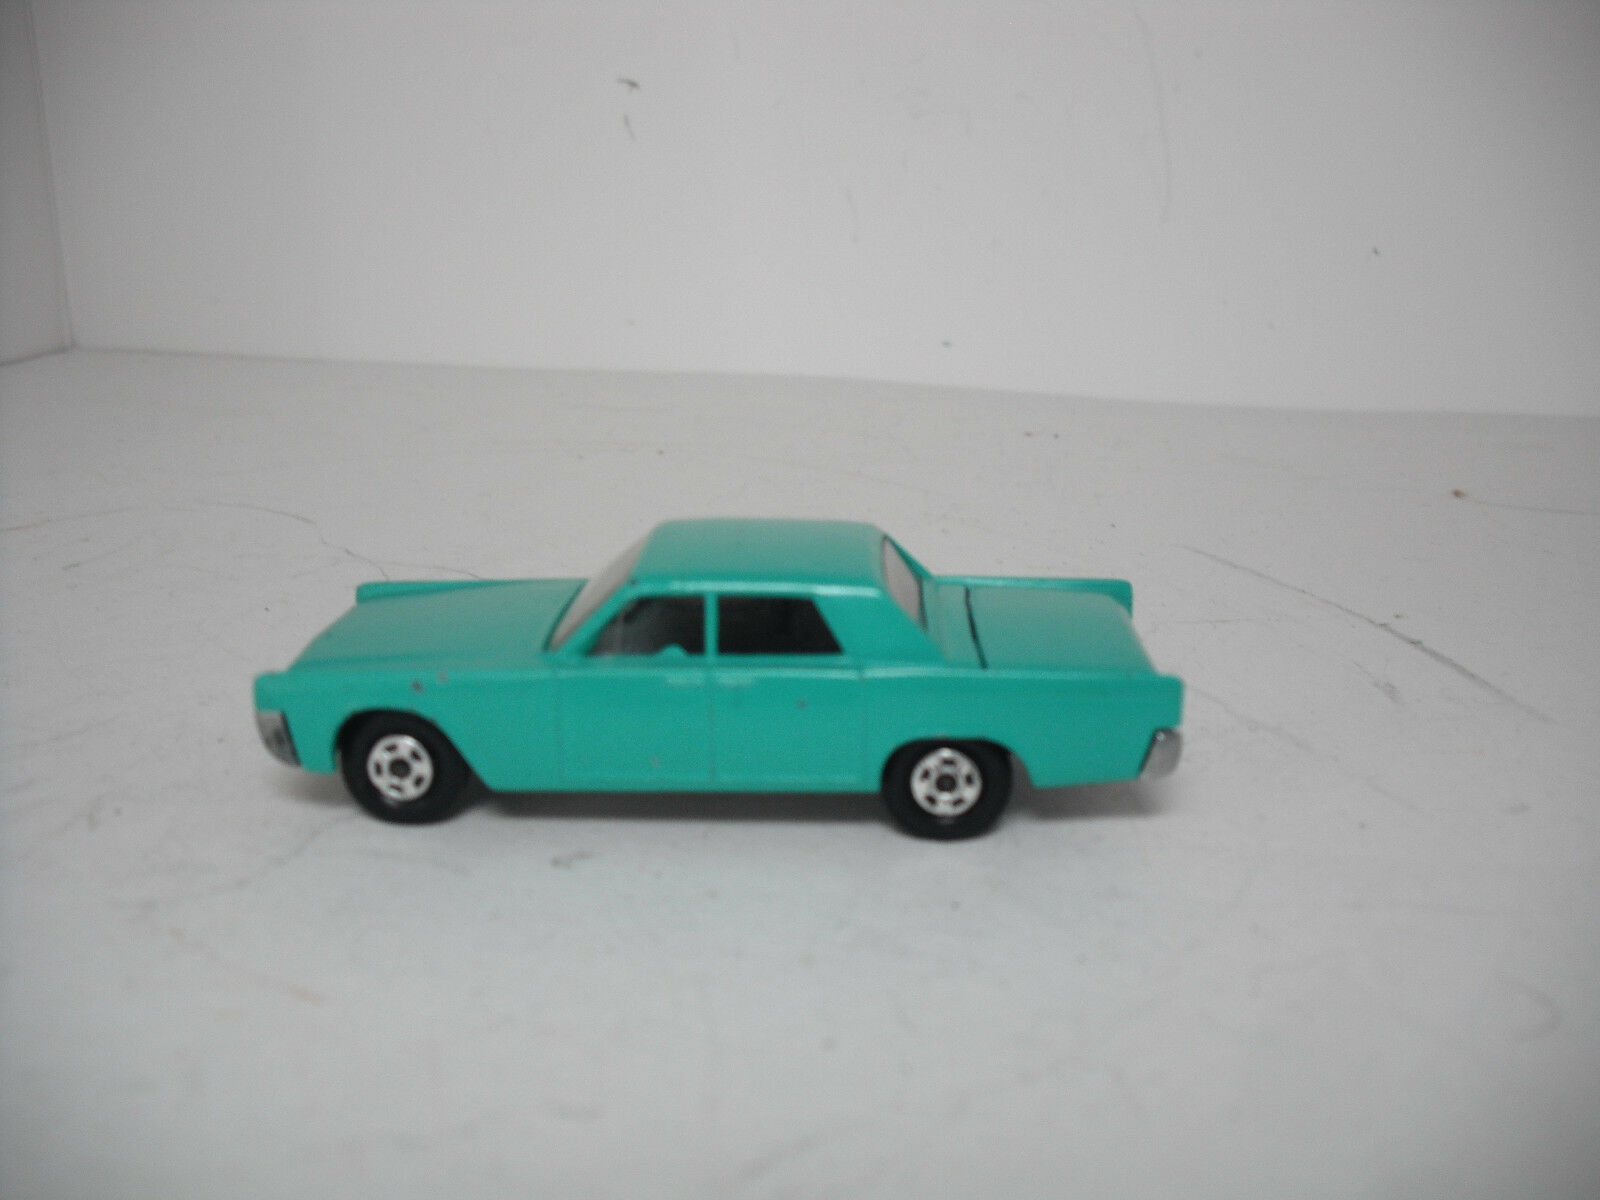 MATCHBOX LESNEY SUPERFAST  31 Lincoln Continental Resto-Mod Vert Menthe SUPERFAST.